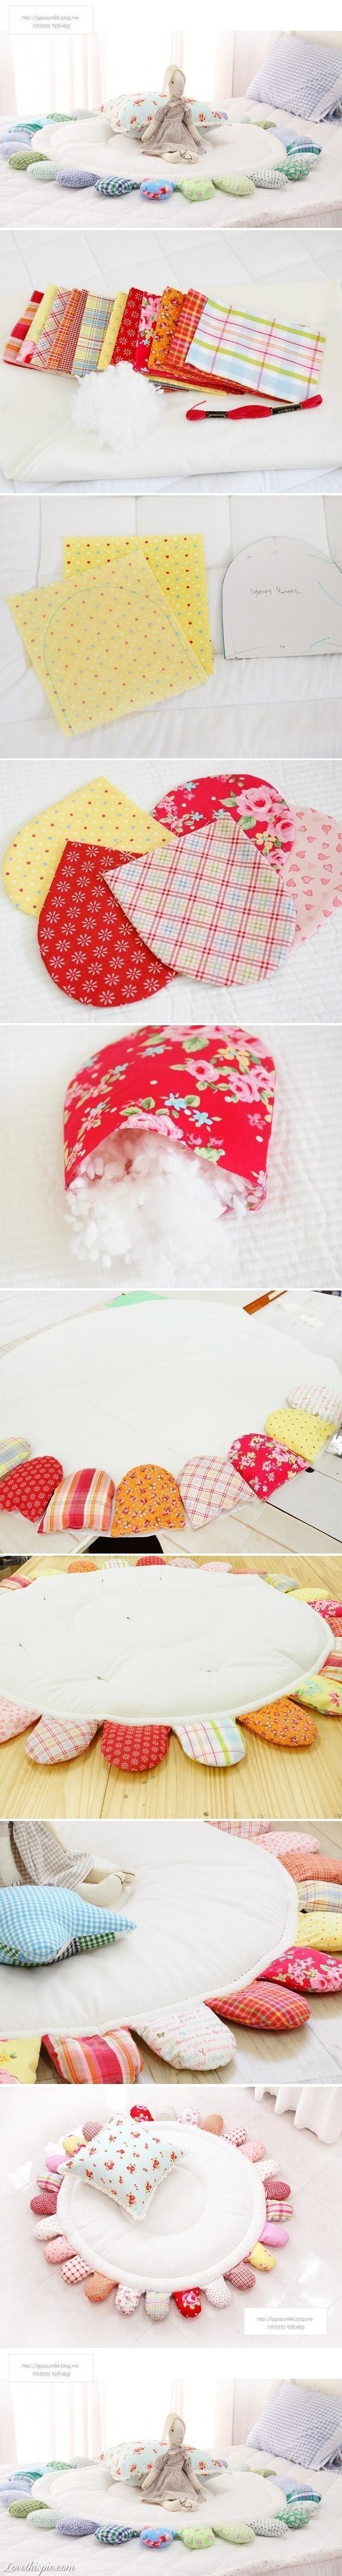 diy childrens rug diy craft crafts easy diy cute diy for the home useful diy